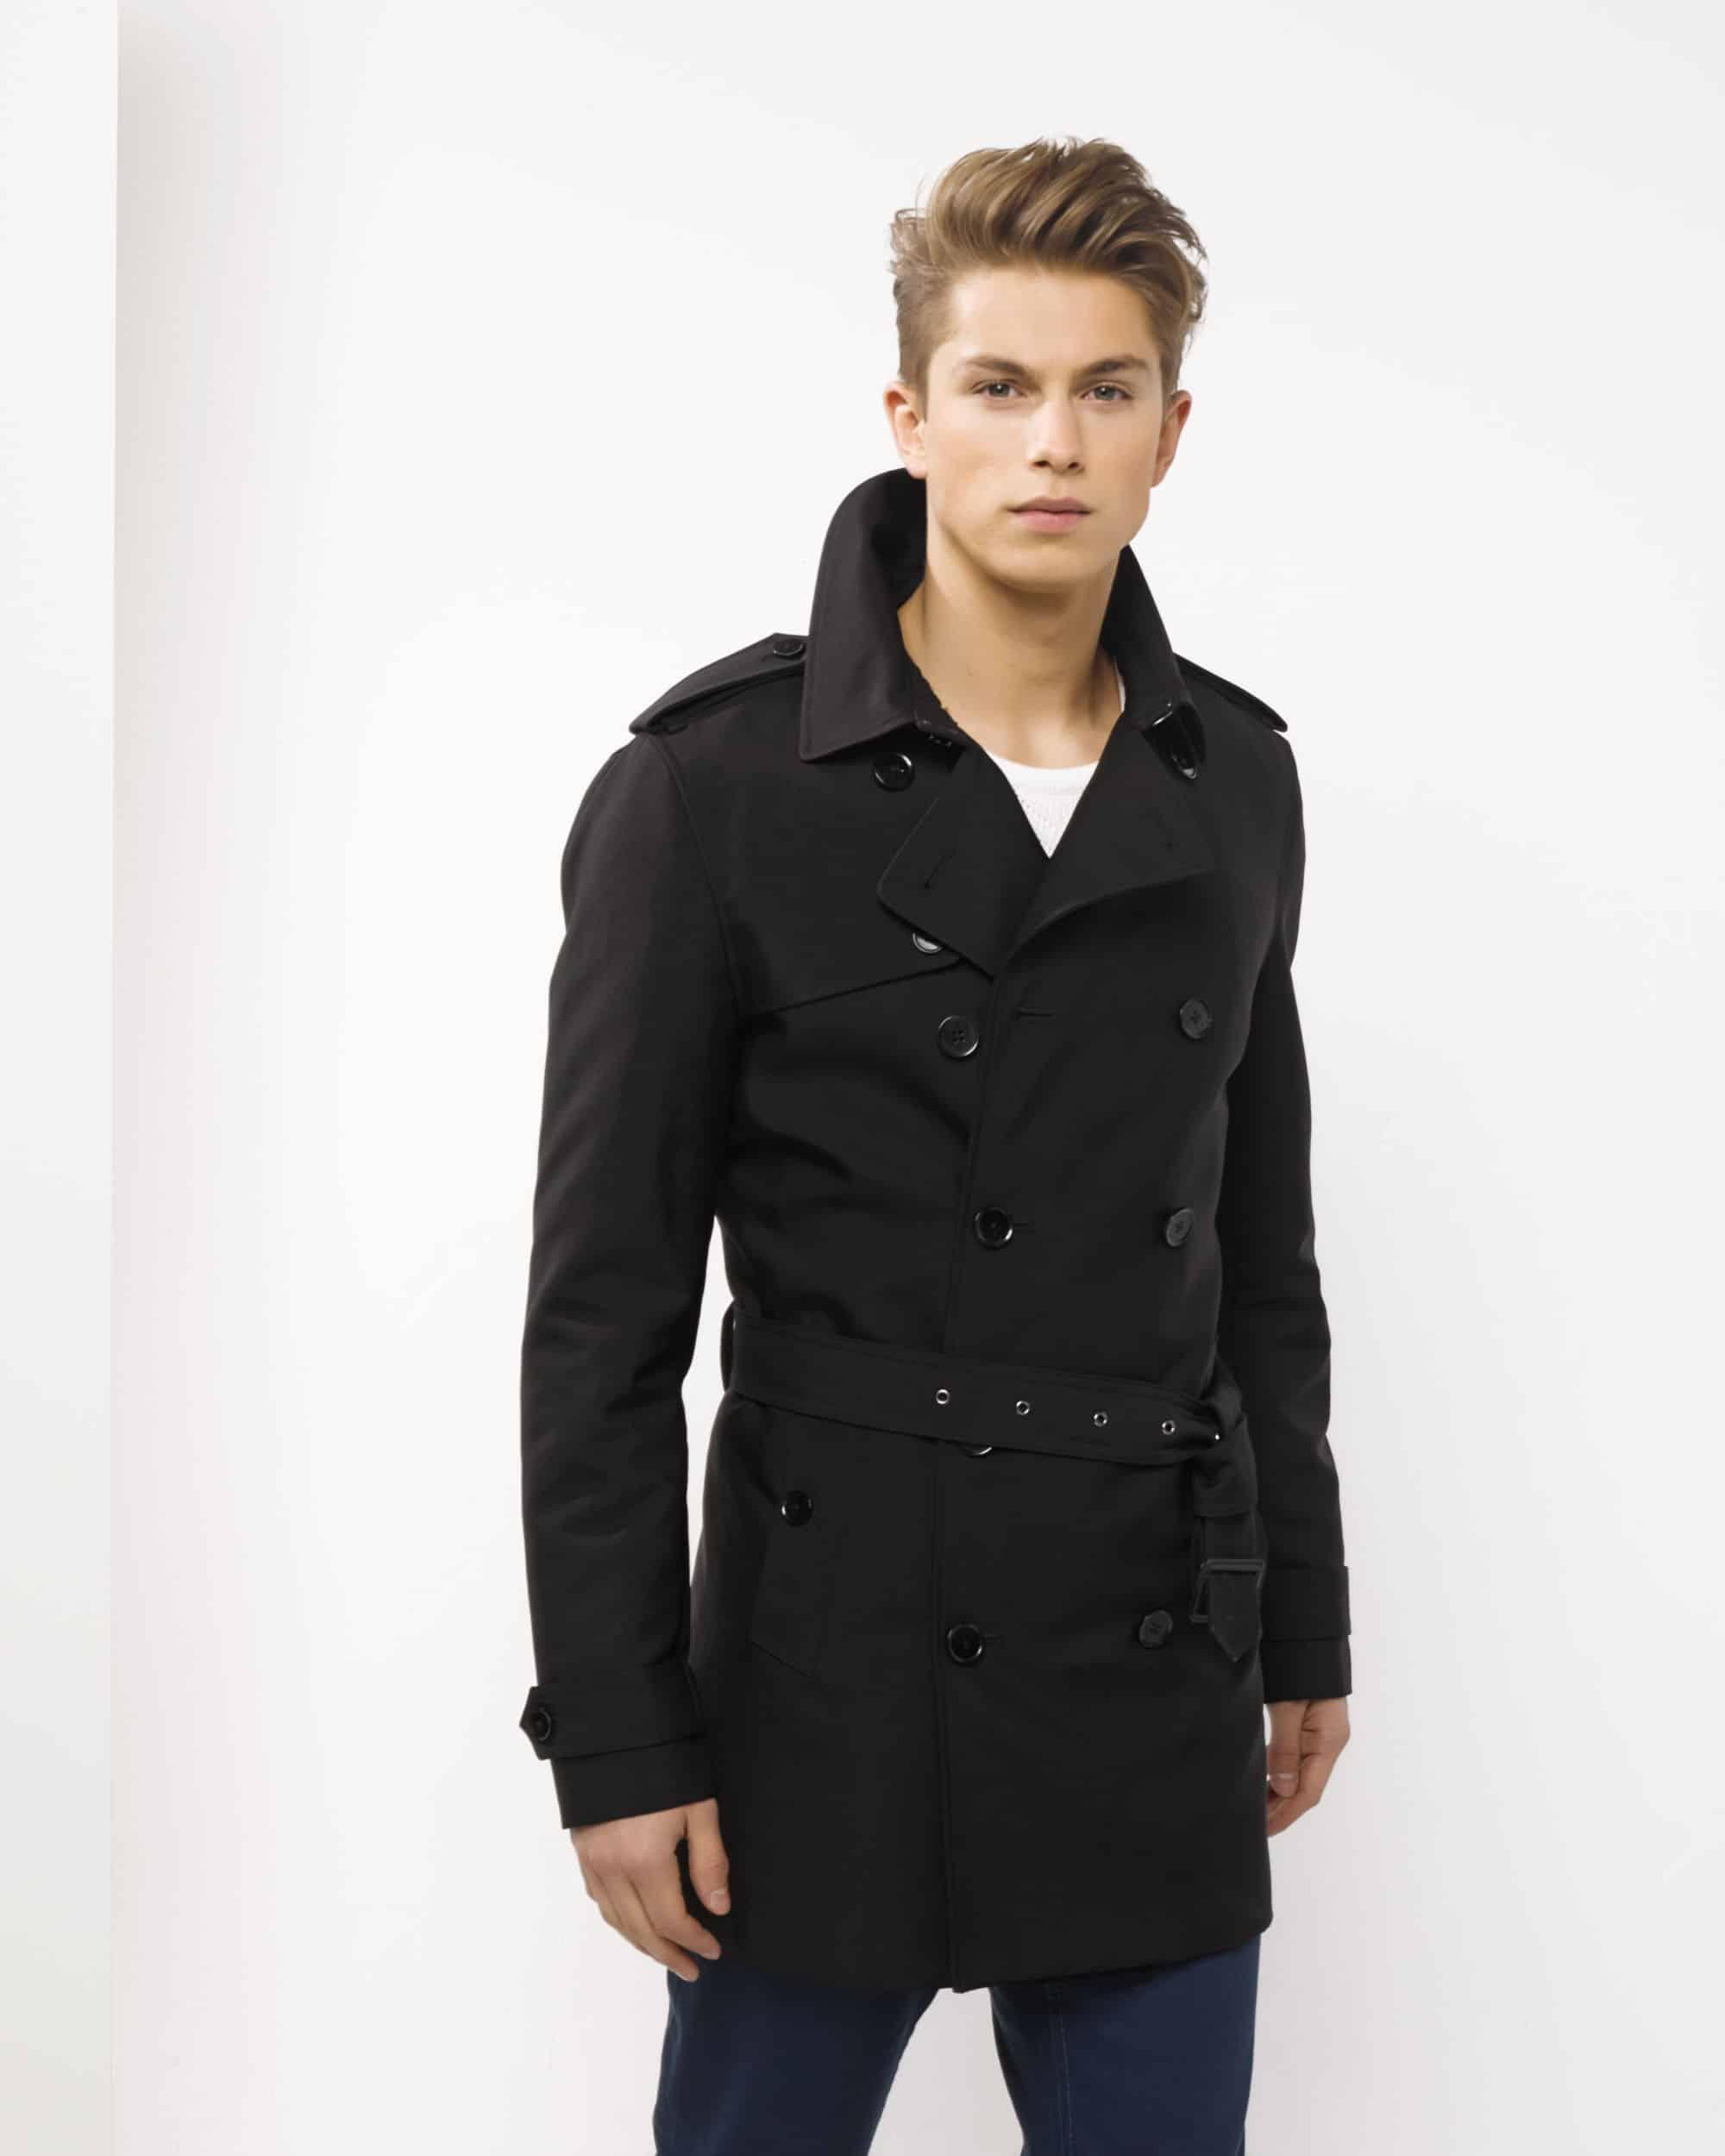 trench coat homme court ou long. Black Bedroom Furniture Sets. Home Design Ideas